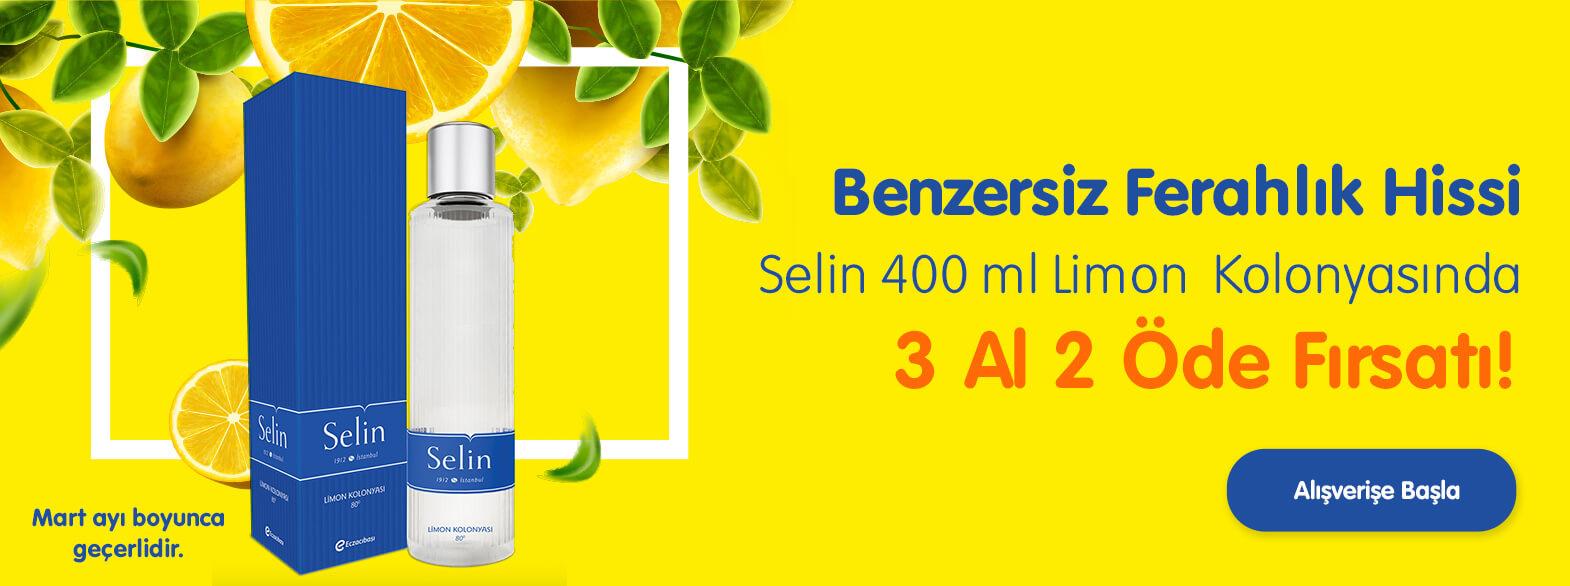 02-03-2021-selin-limon-kolonyasi-tr-yeni.jpg